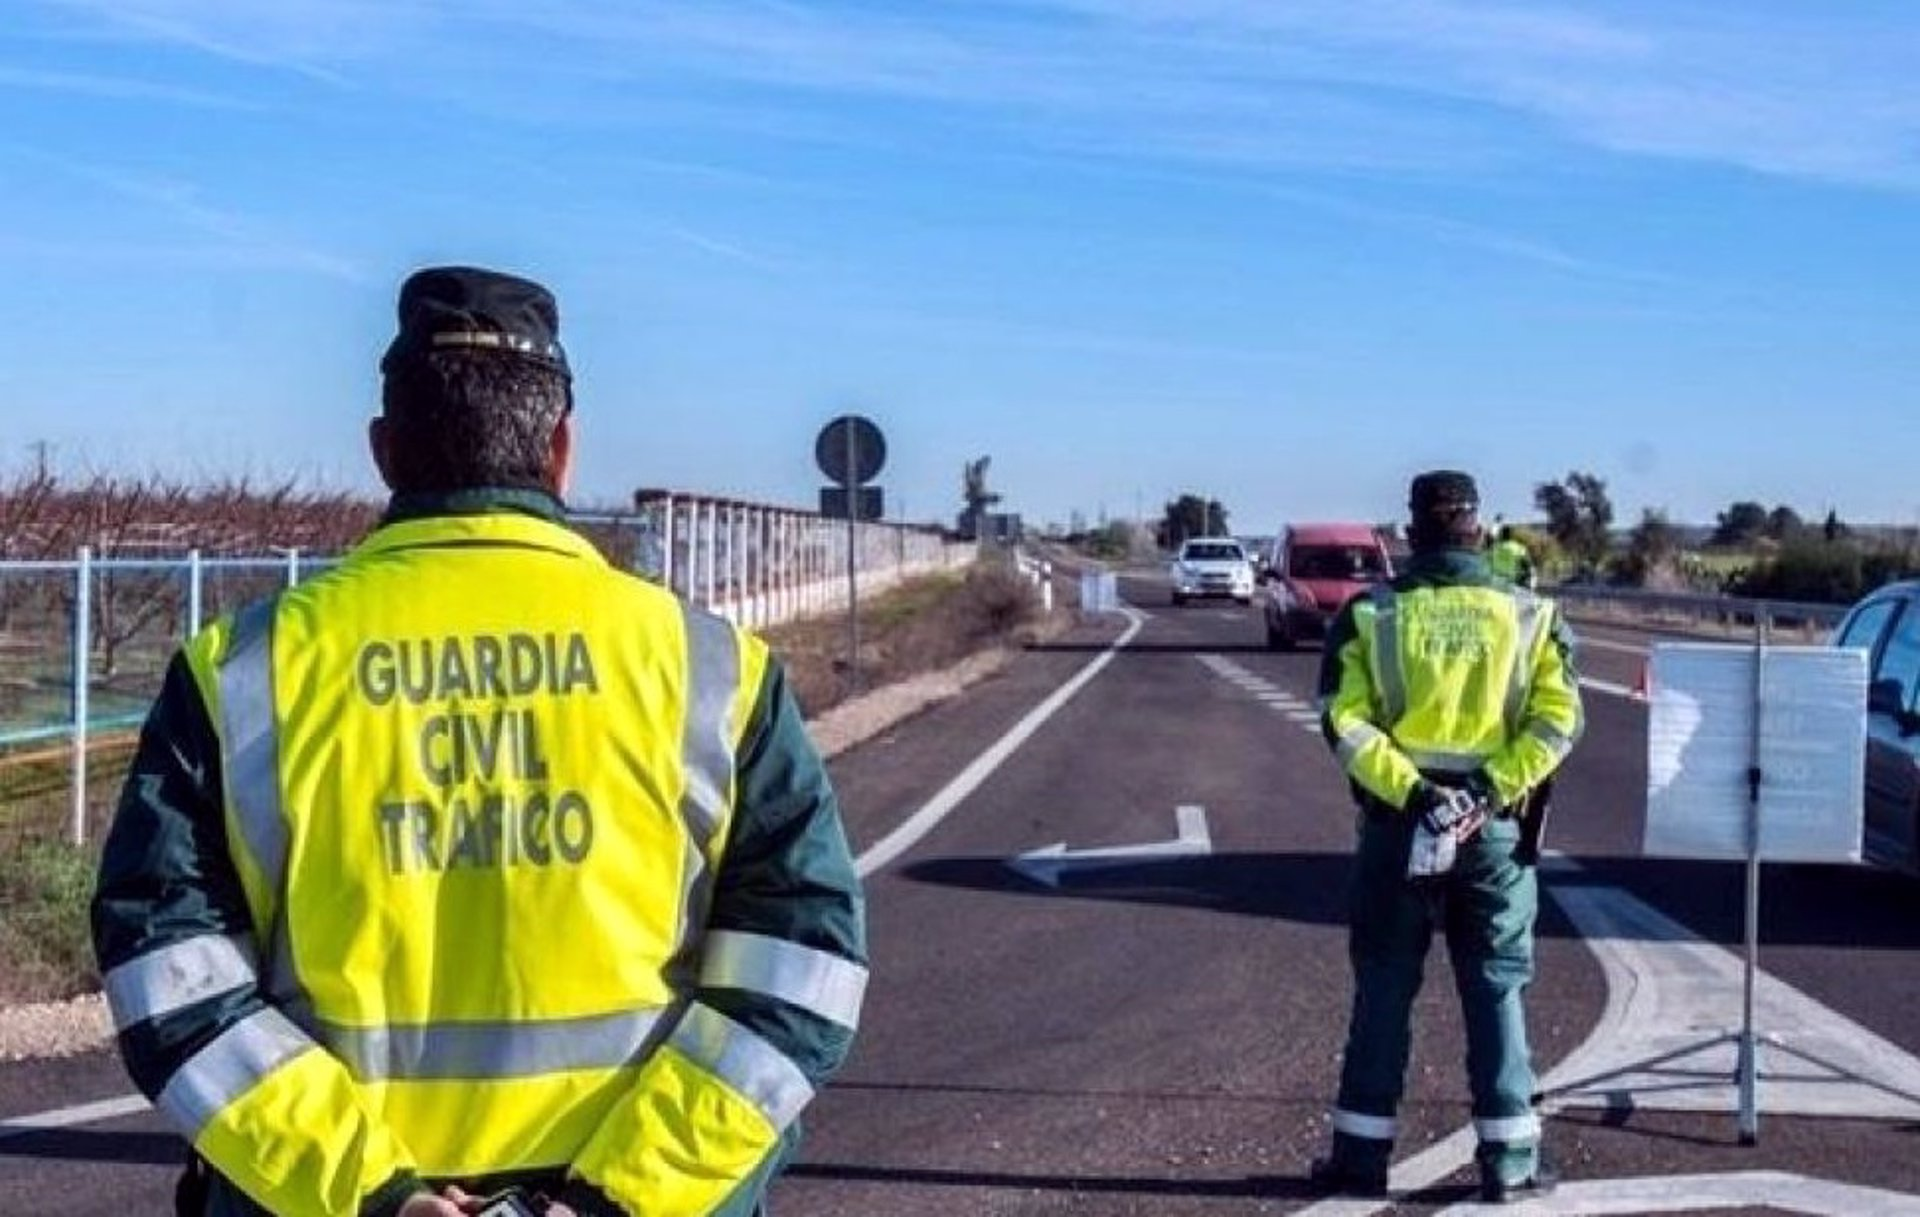 Dos investigados por tráfico de droga en un control de tráfico en Huétor Vega